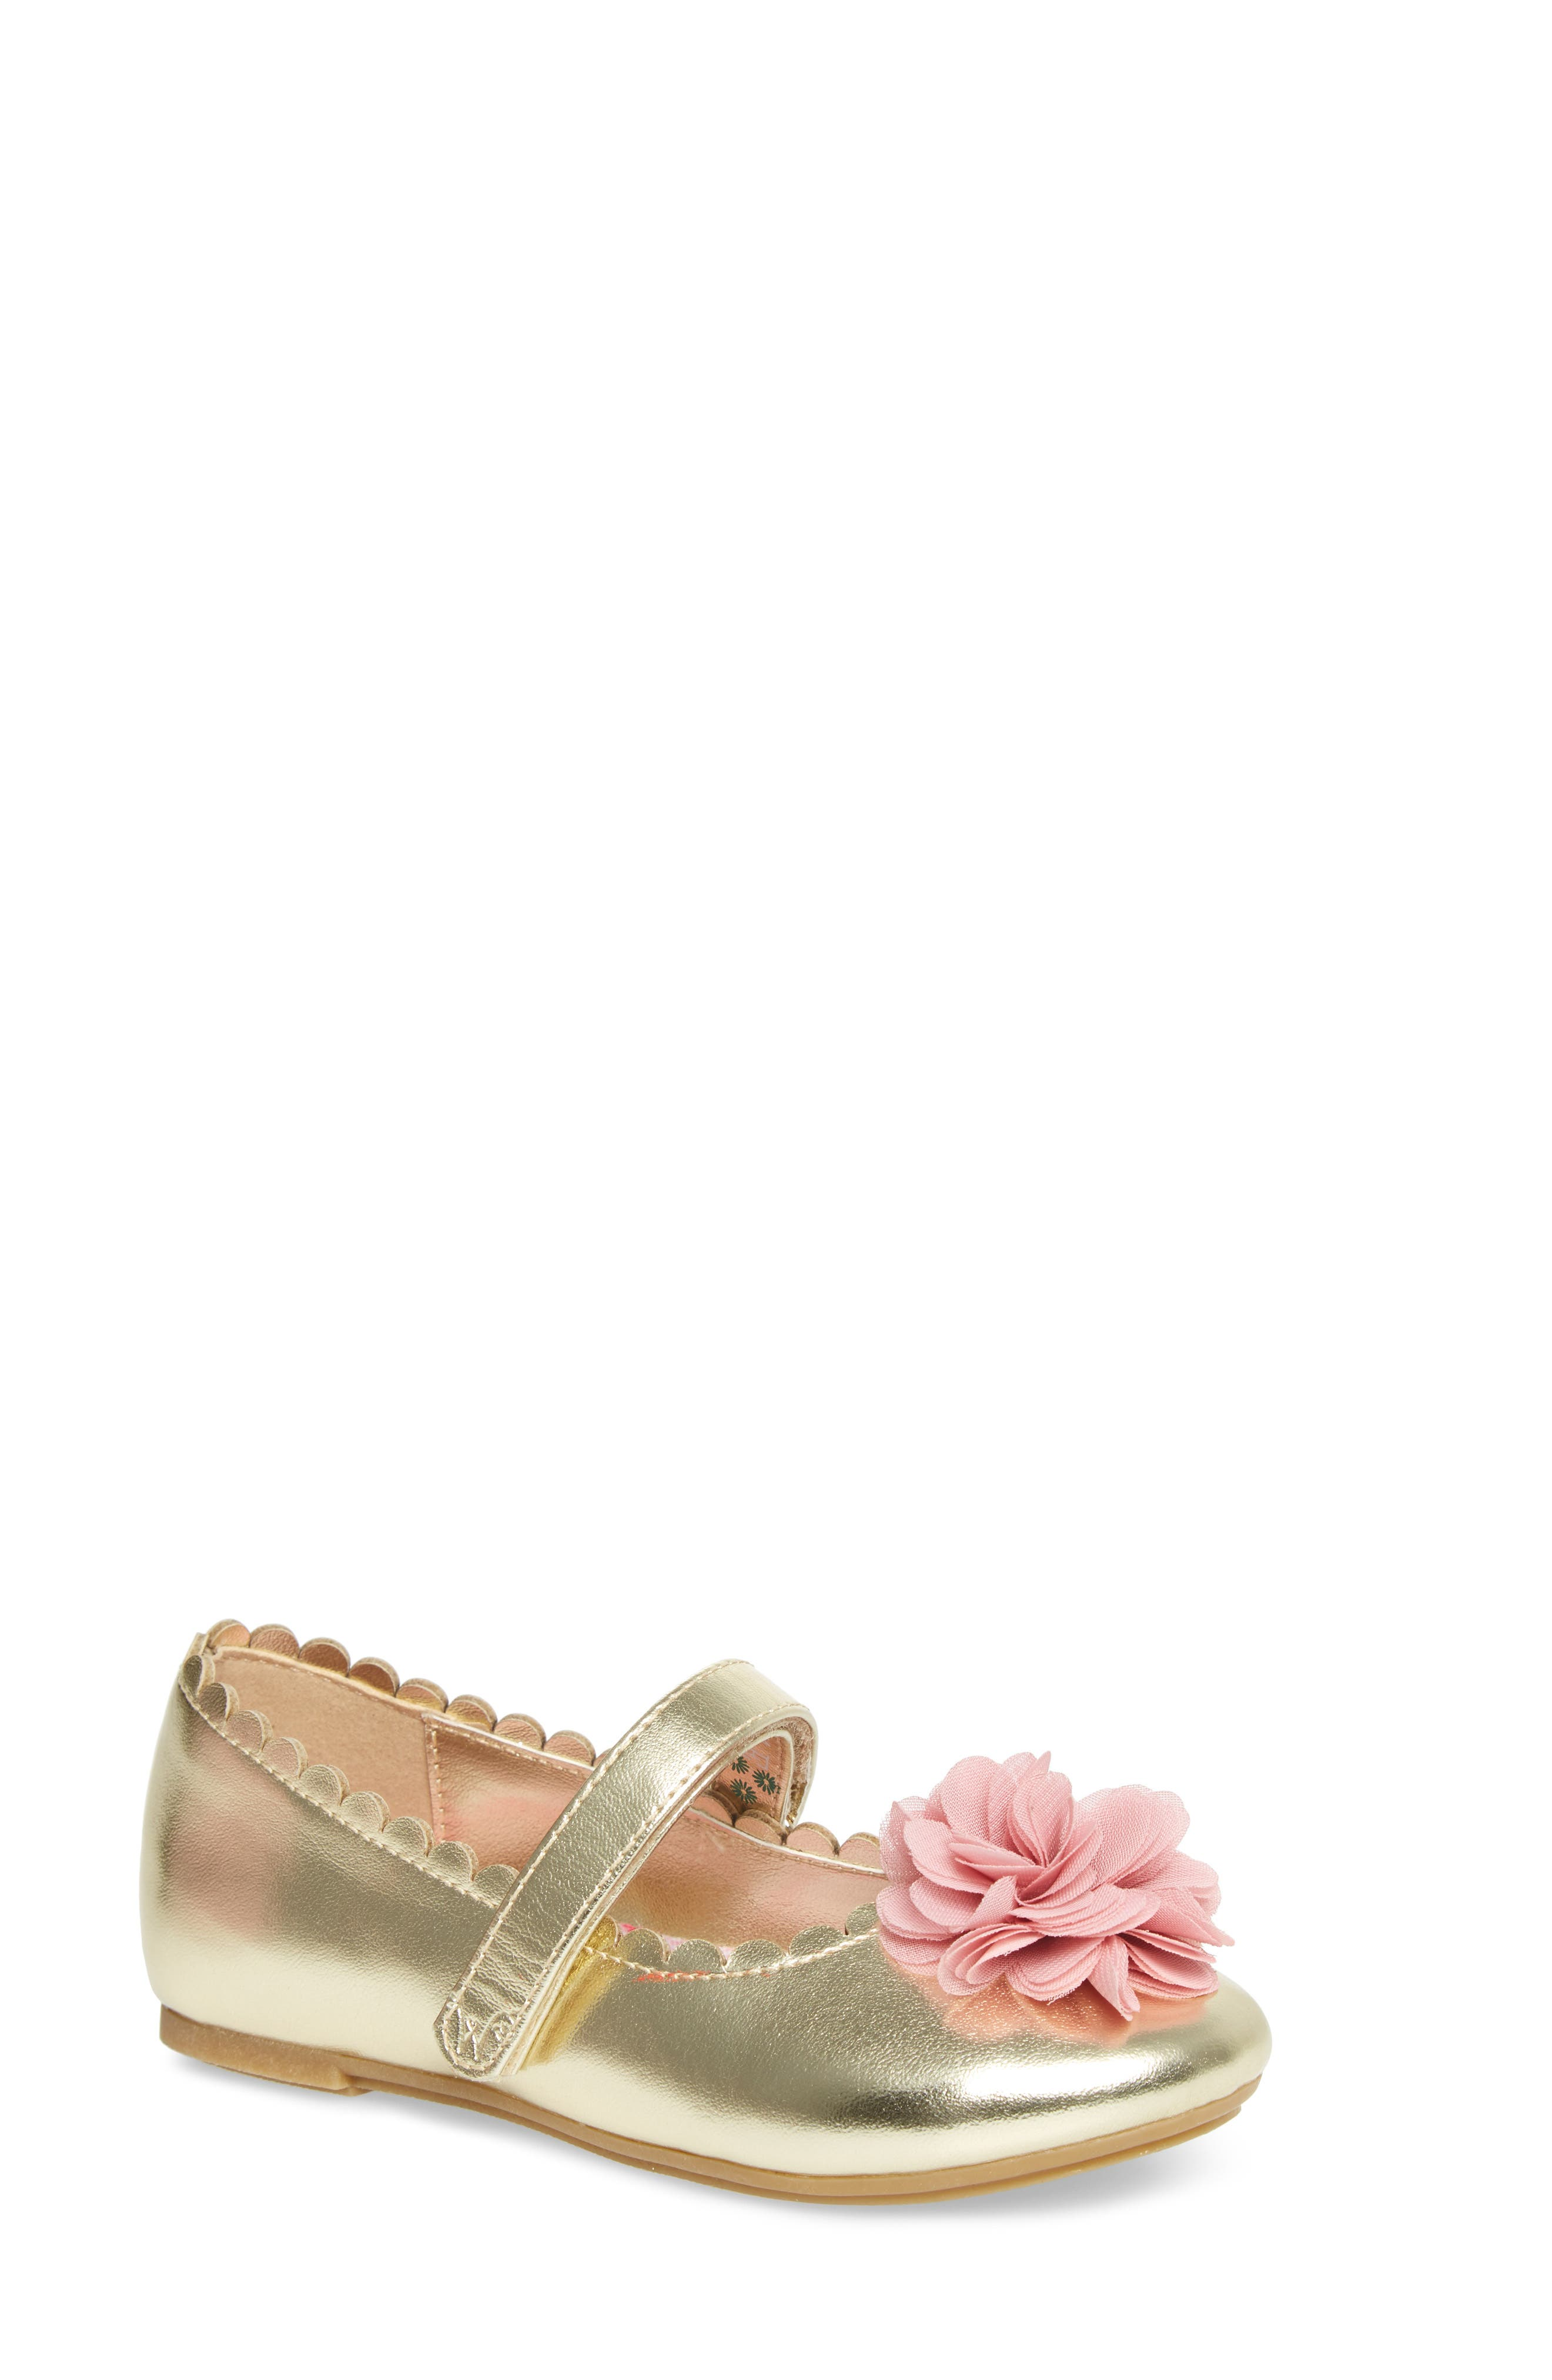 Main Image - WellieWishers from American Girl Ashlyn Flower Strap Ballet Flat (Walker & Toddler)